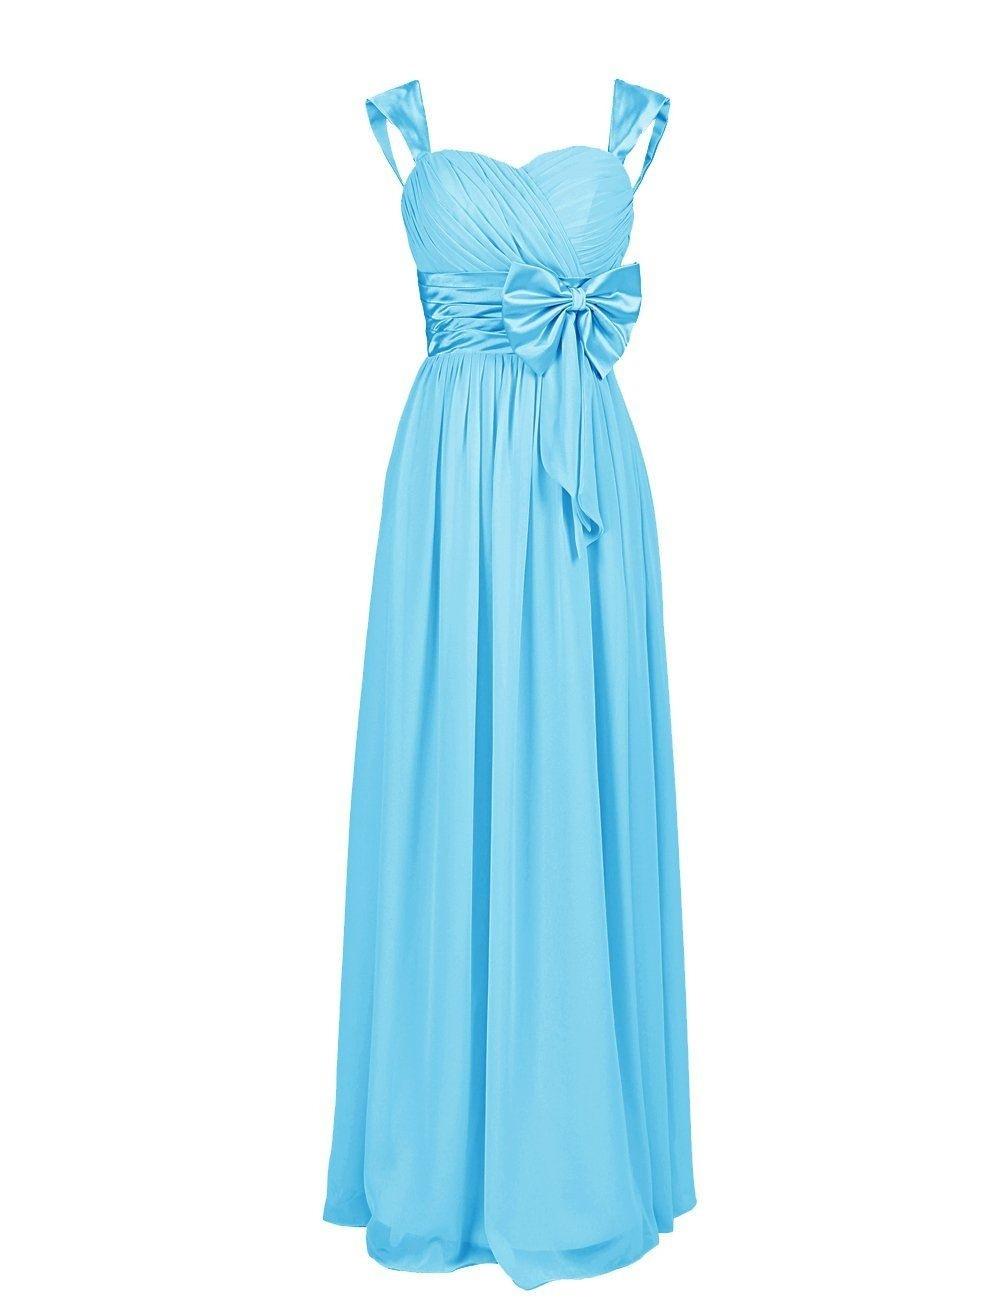 Designer Luxurius Zalando Damen Abendkleid Design17 Luxurius Zalando Damen Abendkleid Bester Preis